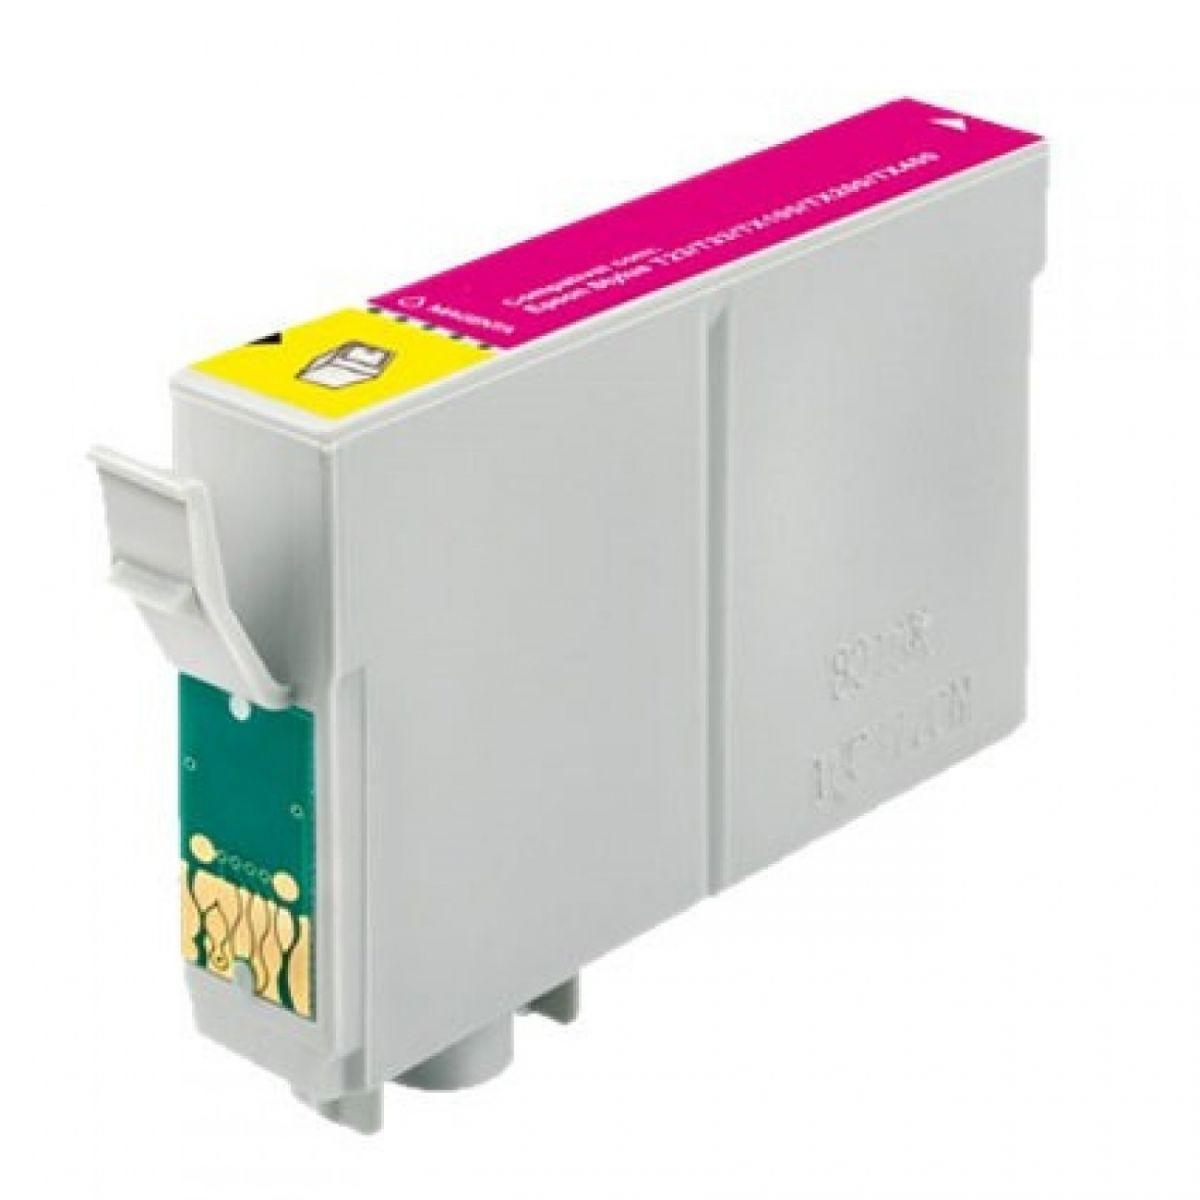 Cartucho Epson T1033 T103320 T103  Magenta | TX600FW TX550FW T40W T1110 | Compatível